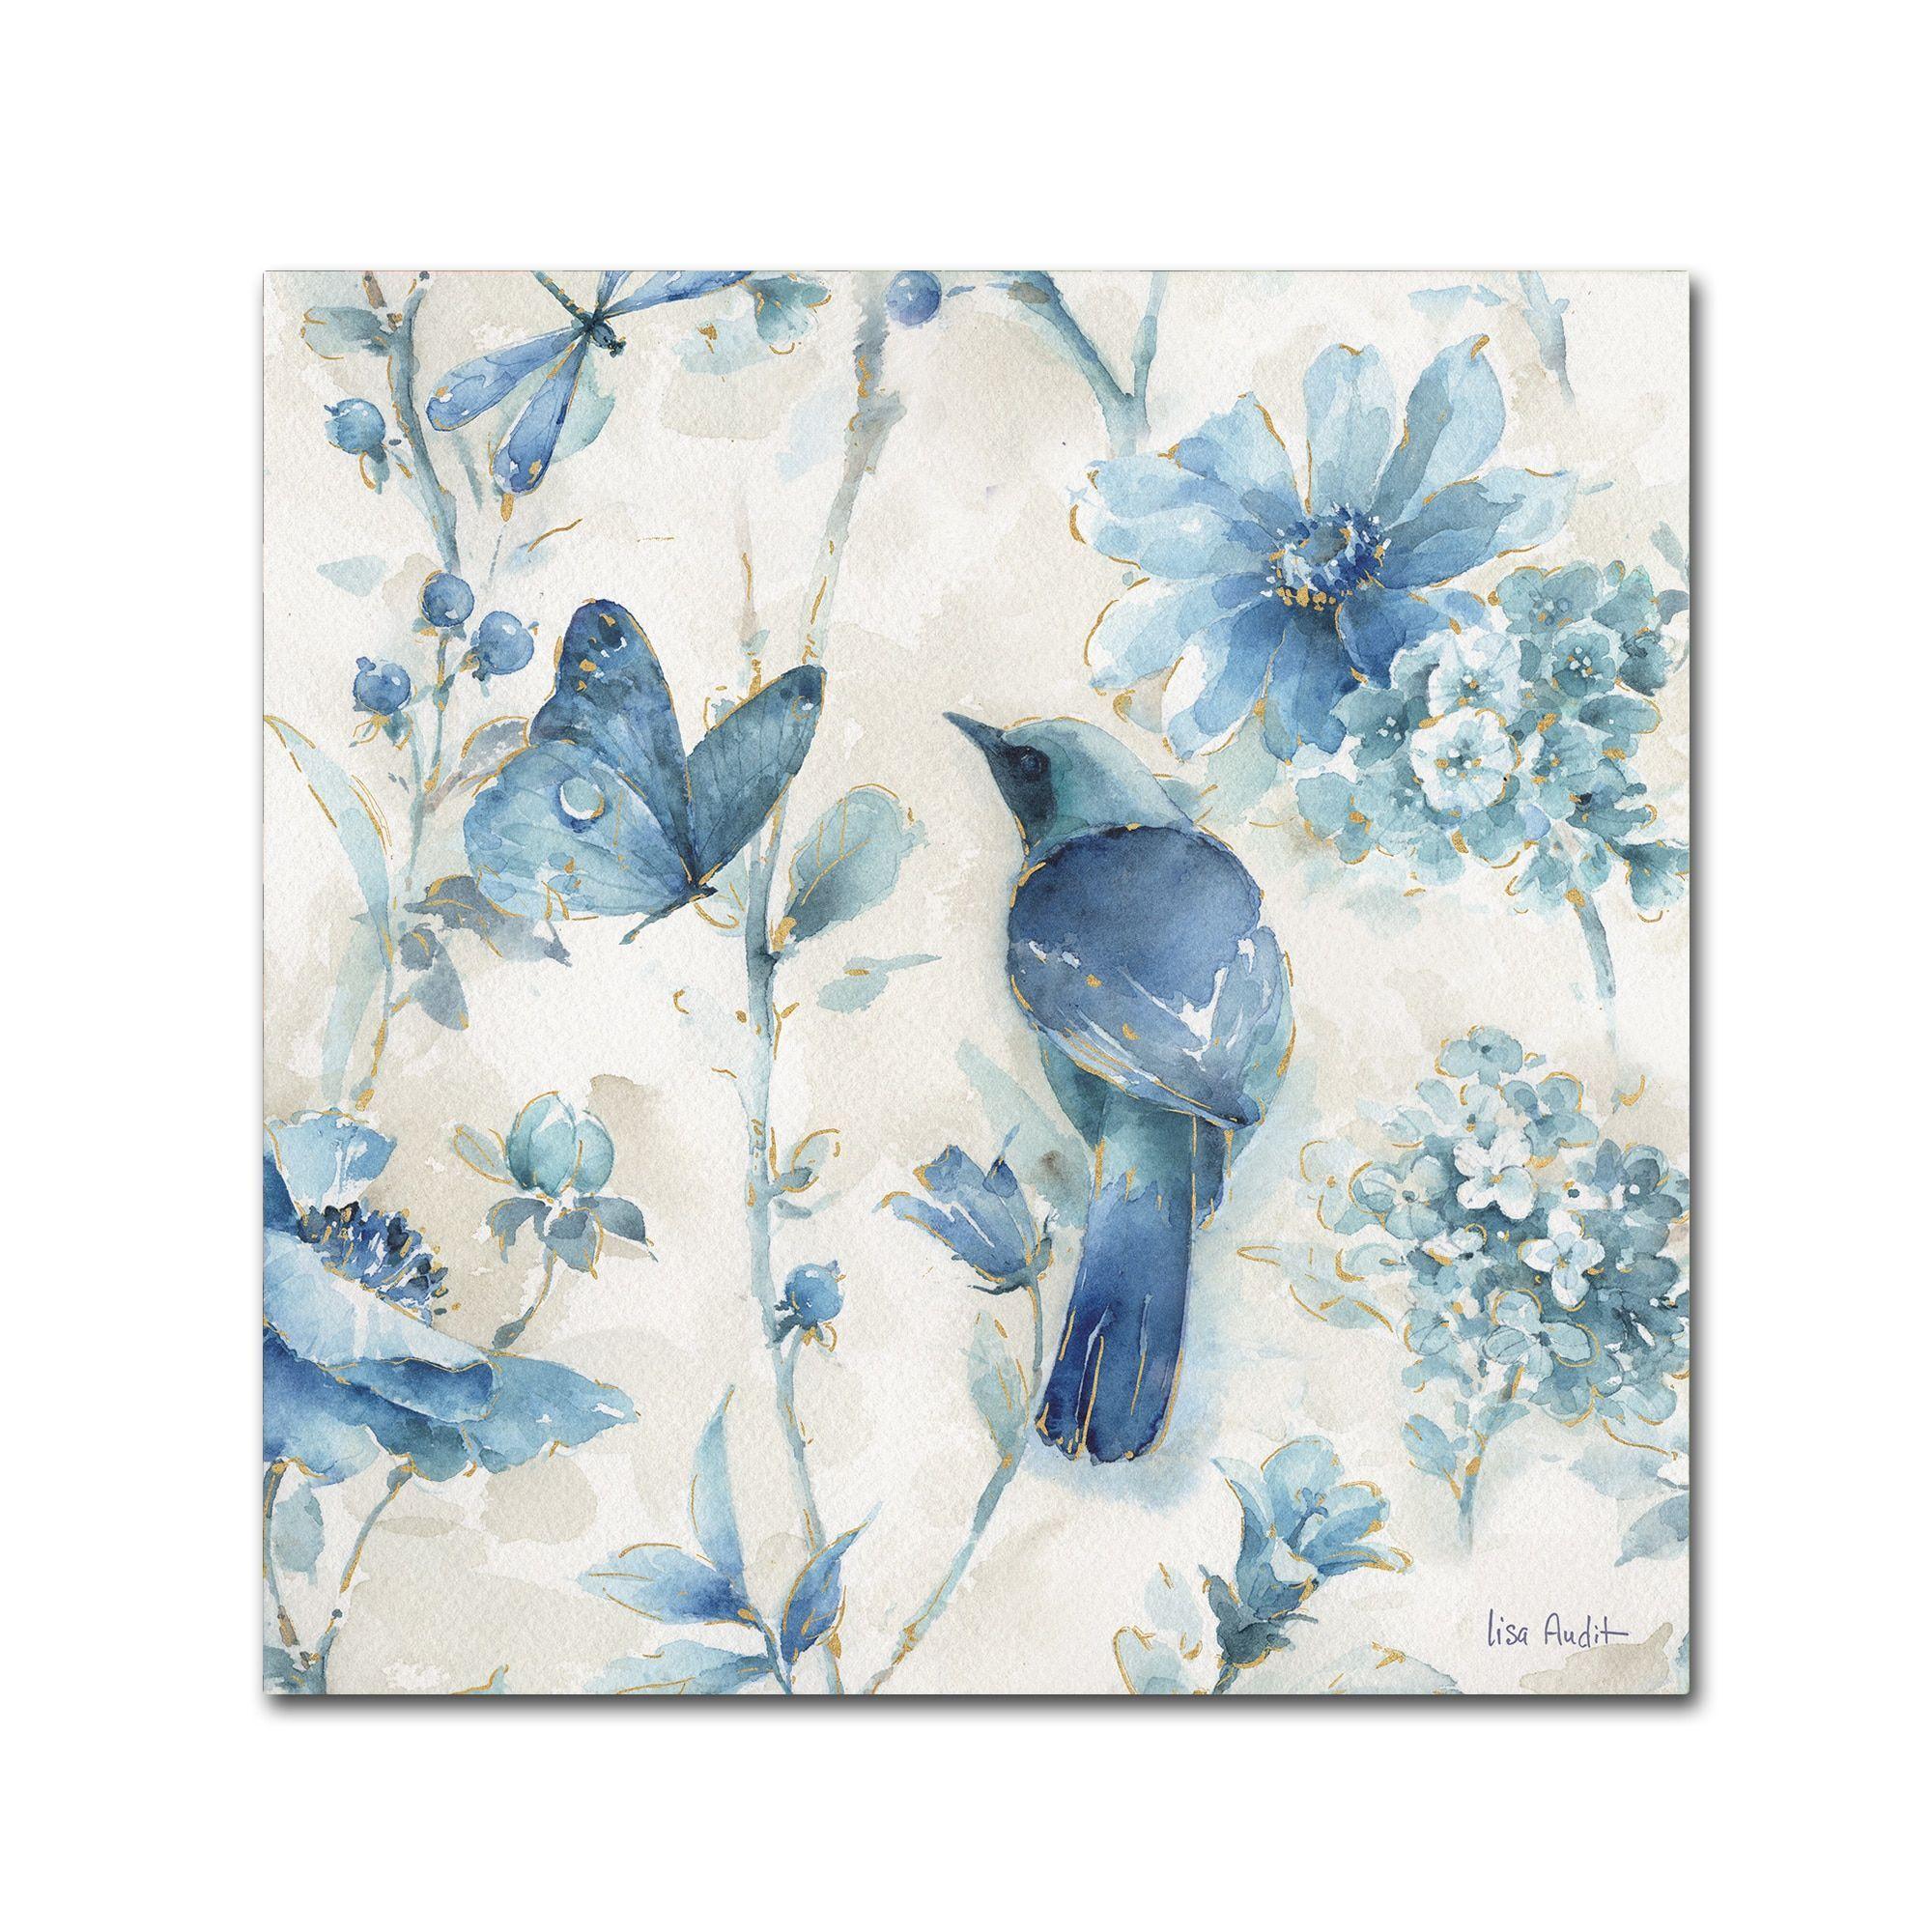 Lisa Audit \'Indigold Xii\' Canvas Art | Products | Pinterest